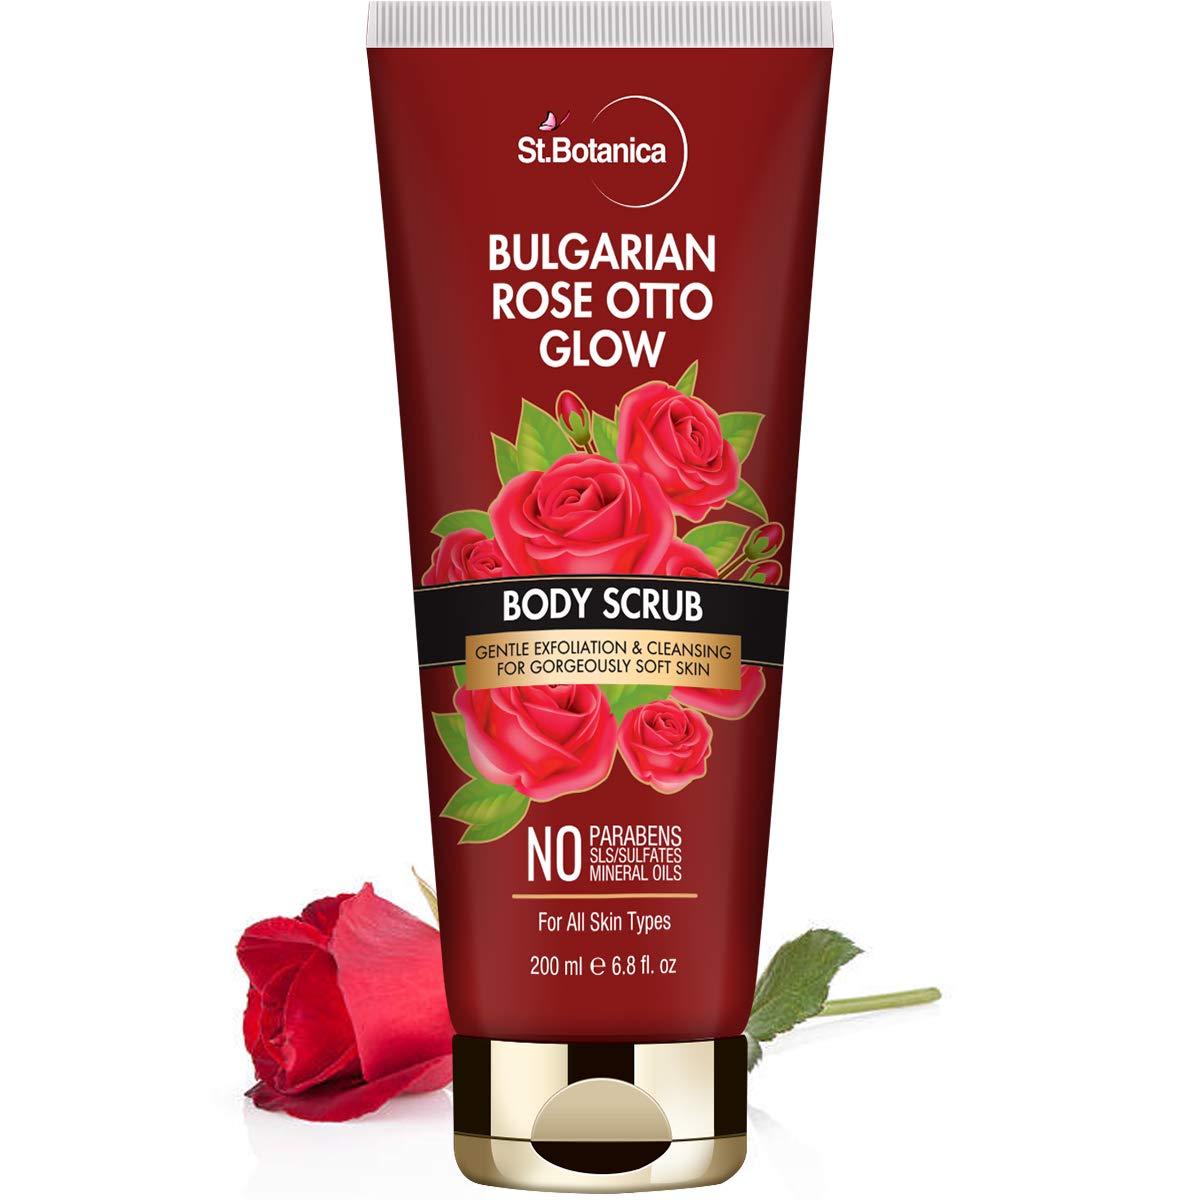 High order Year-end gift StBotanica Bulgarian Rose Otto Glow Gentle Exfoliat Body Scrub